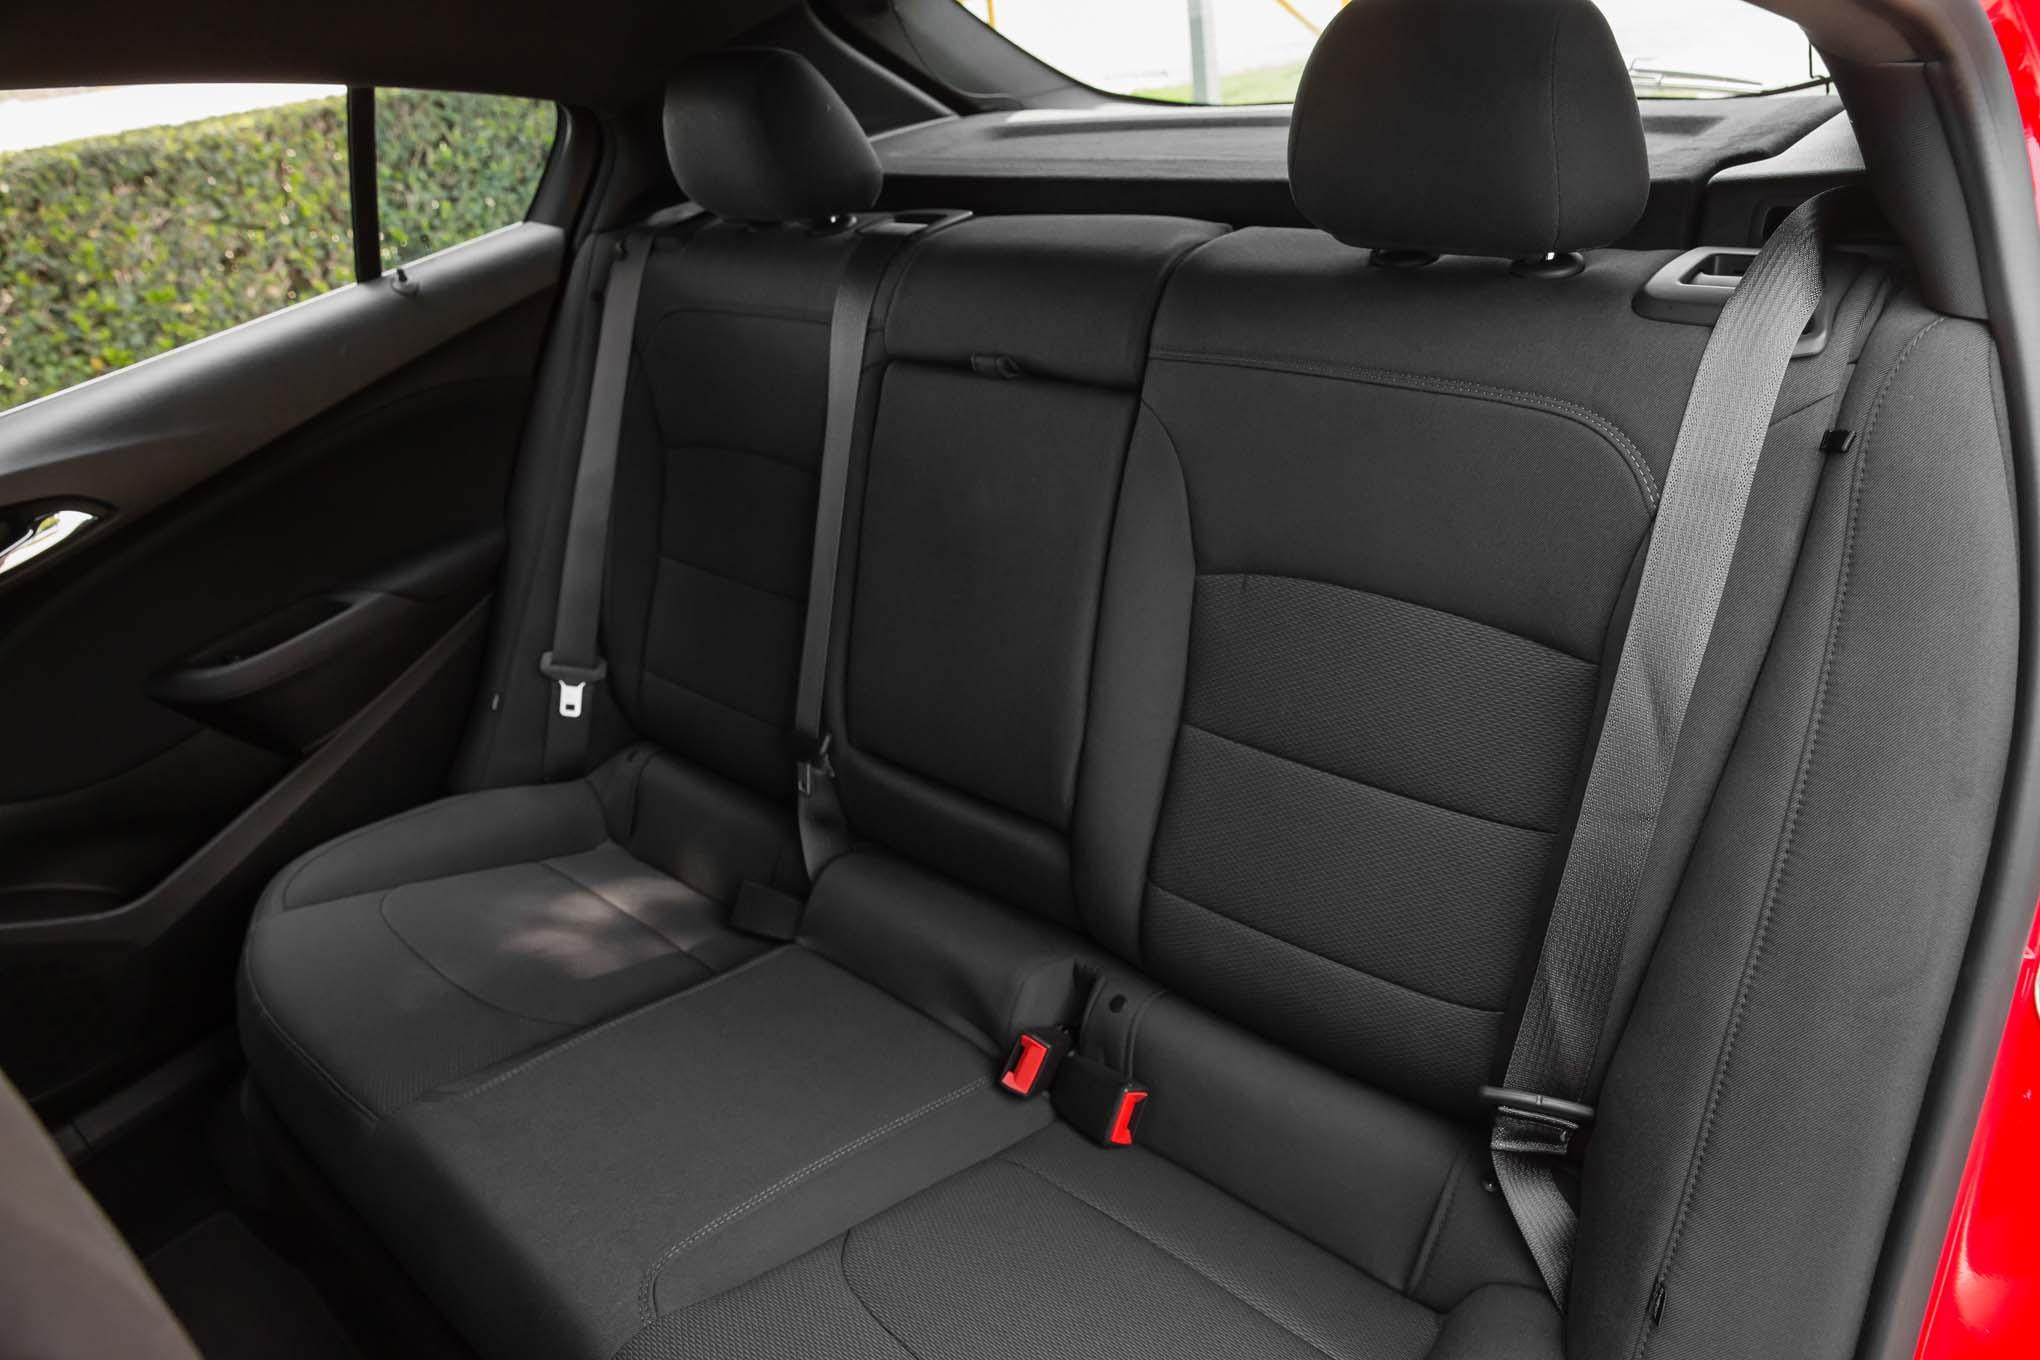 Chevy Cruze Interior >> Chevrolet Cruze LT Hatchback 2017: Primera Prueba - Motor Trend en Español